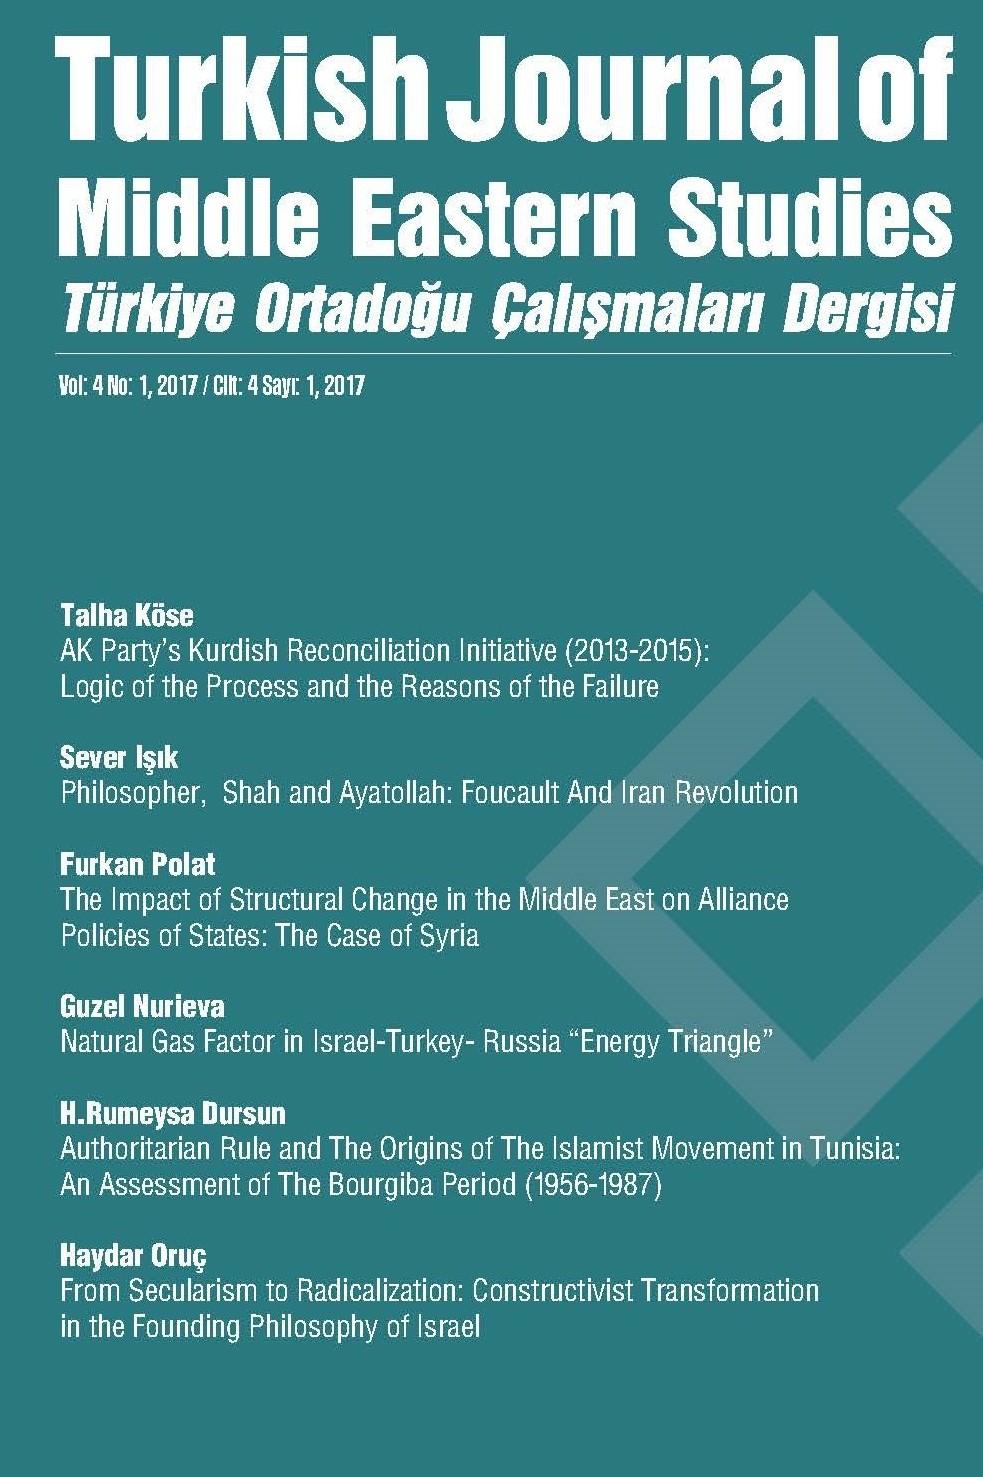 Turkish Journal of Middle Eastern Studies